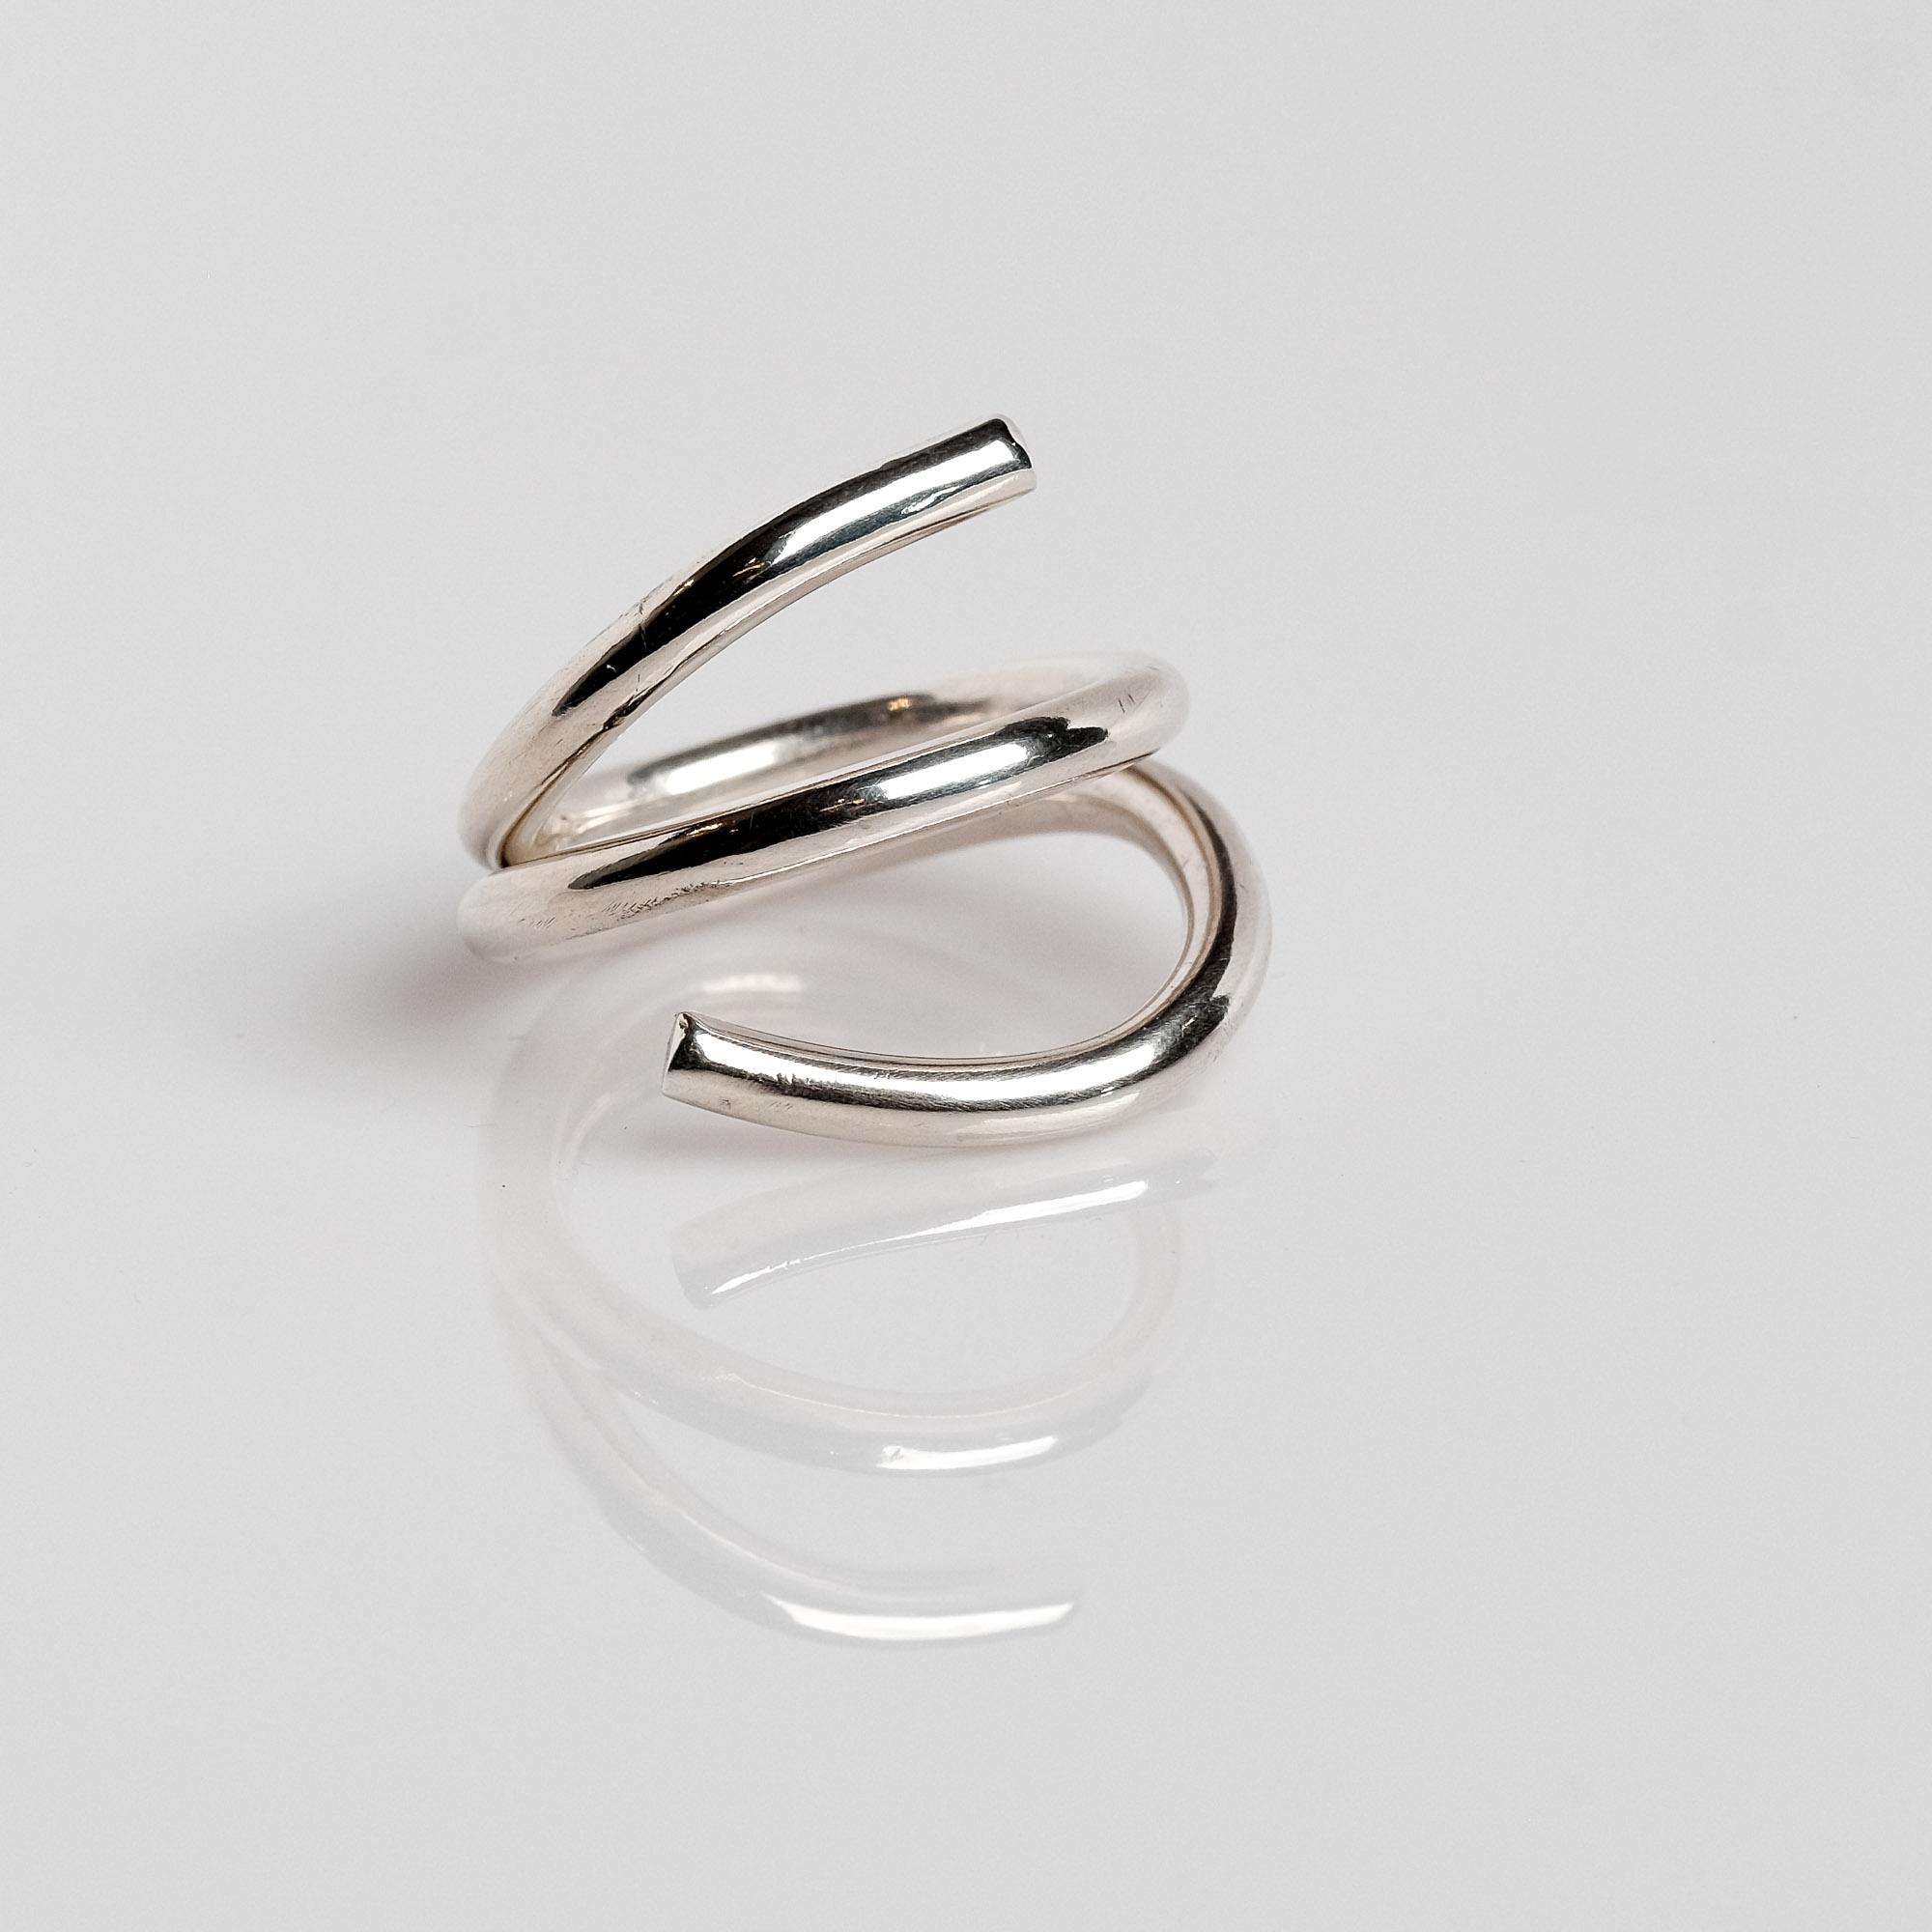 Pris: 750 sterling sølv